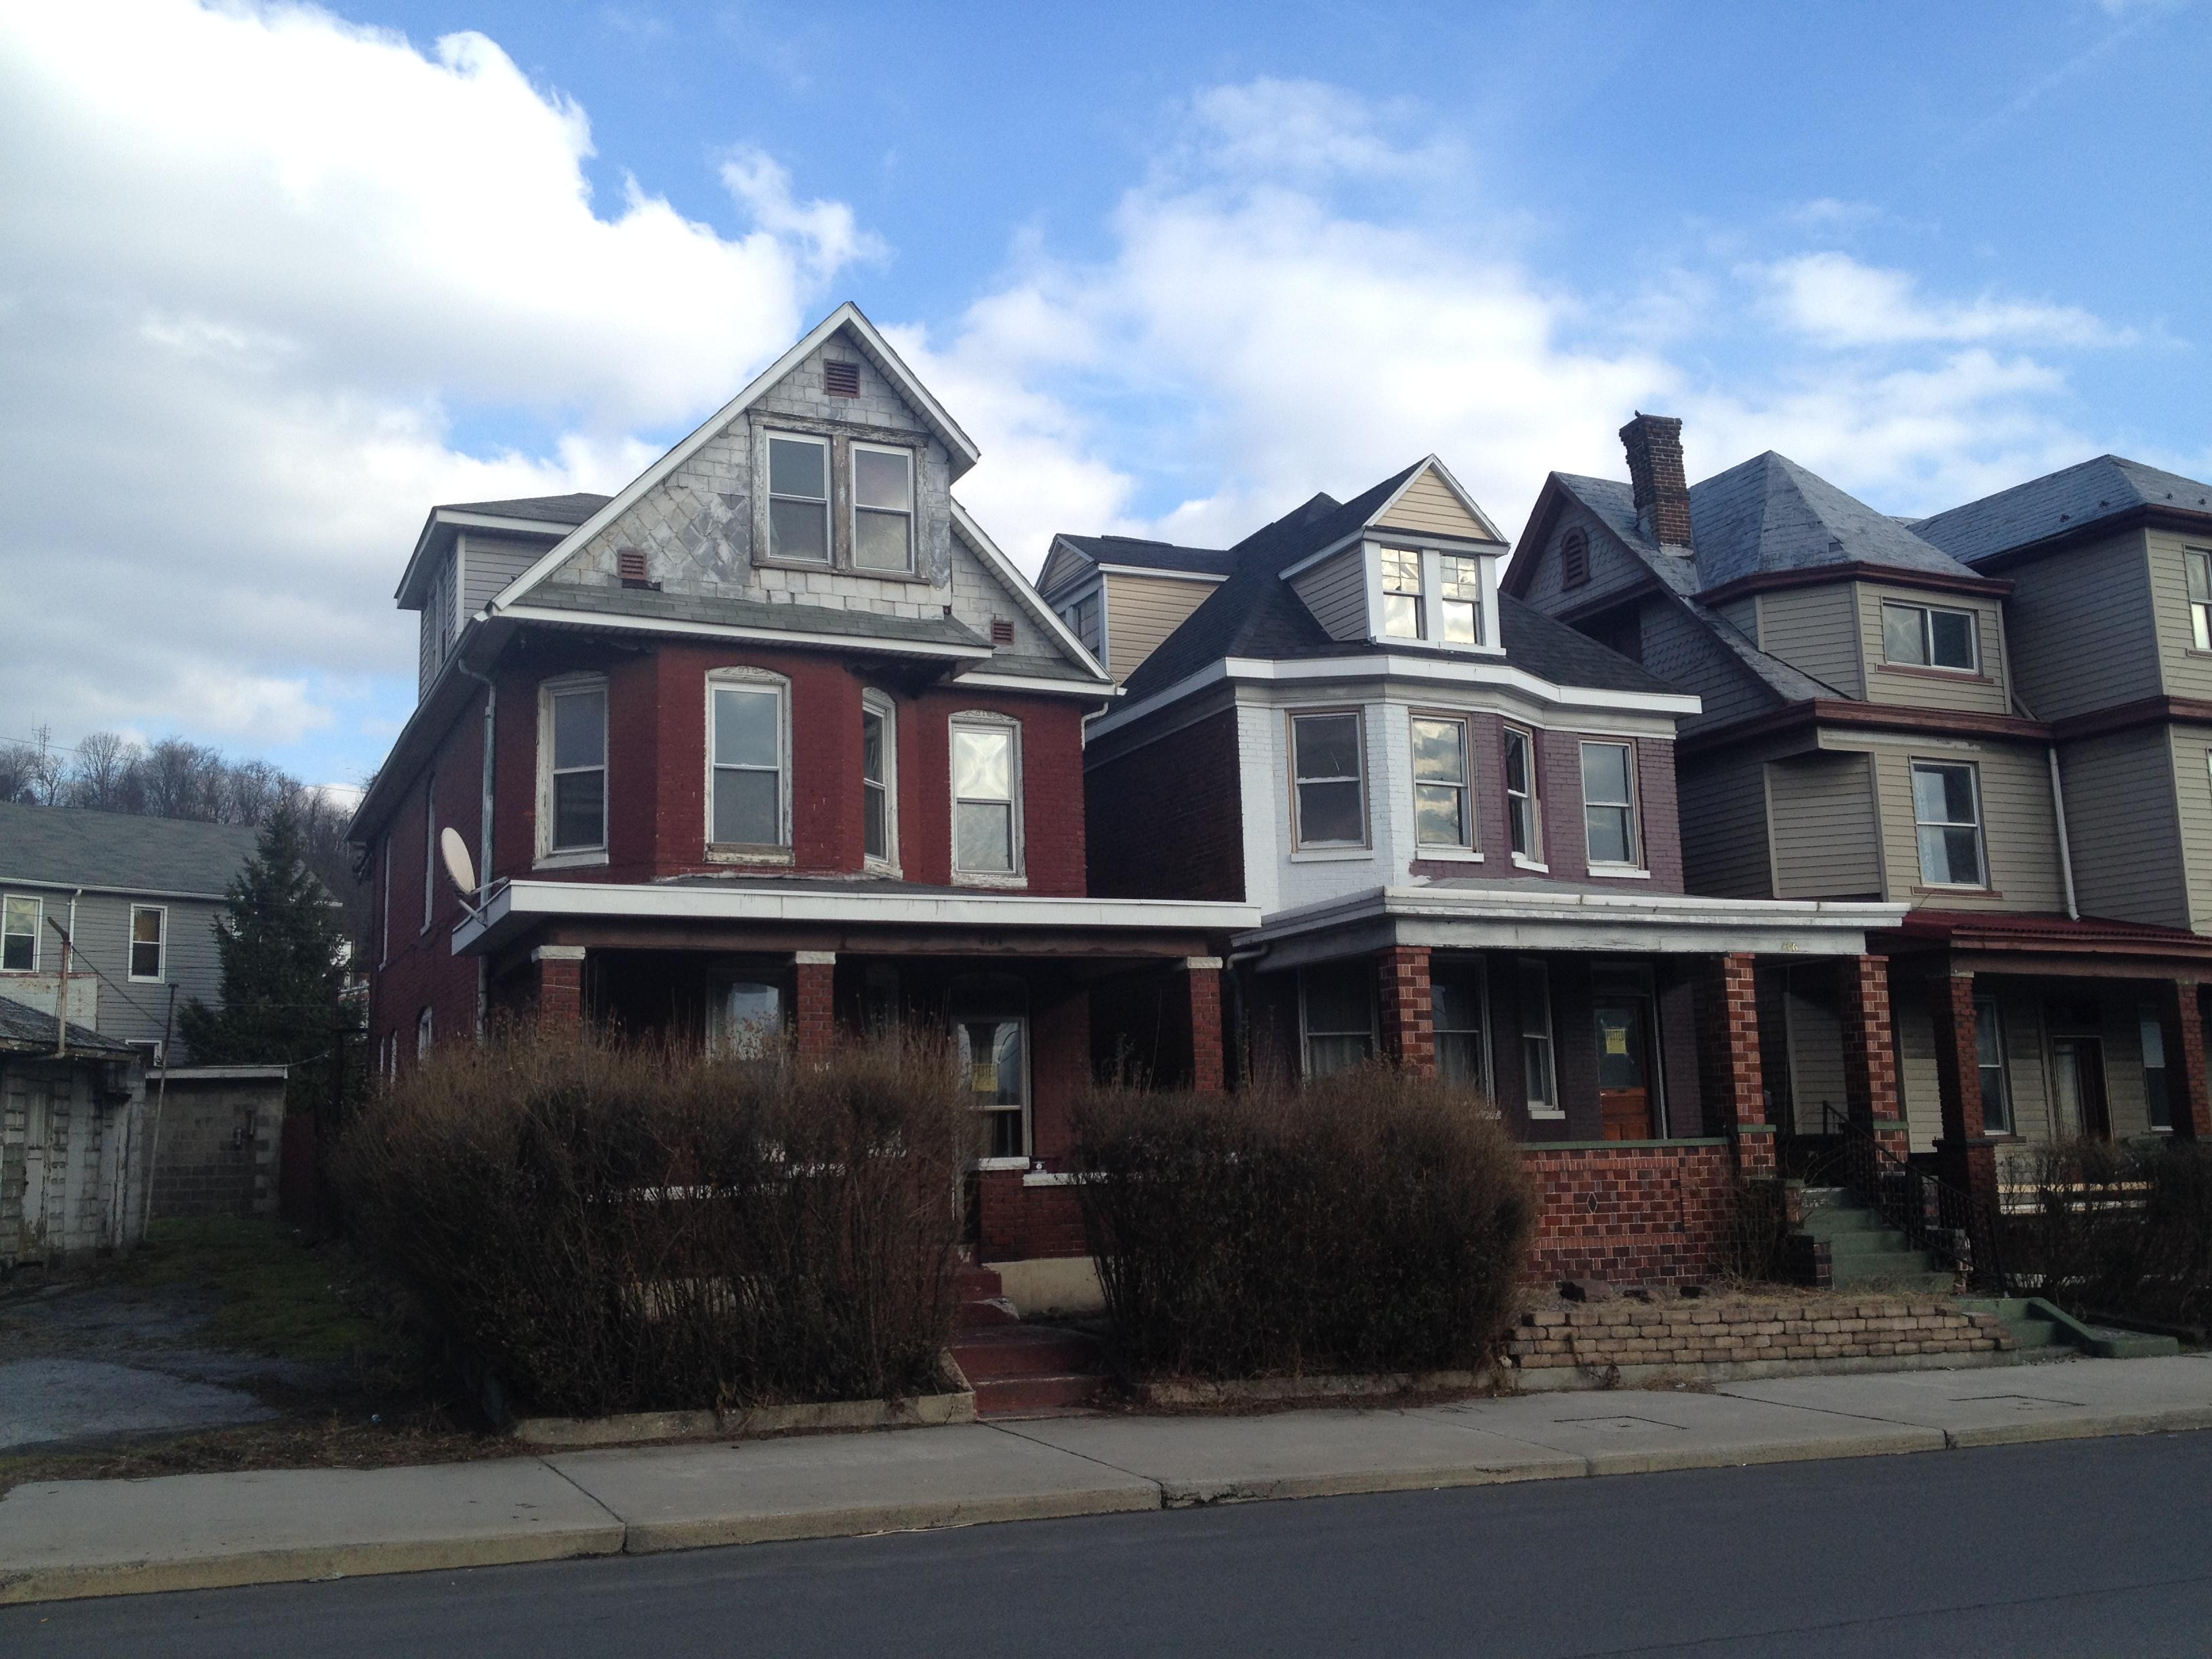 J.S. Seibert designed 404 Park Street in the Rolling Mill neighborhood of Cumberland, MD